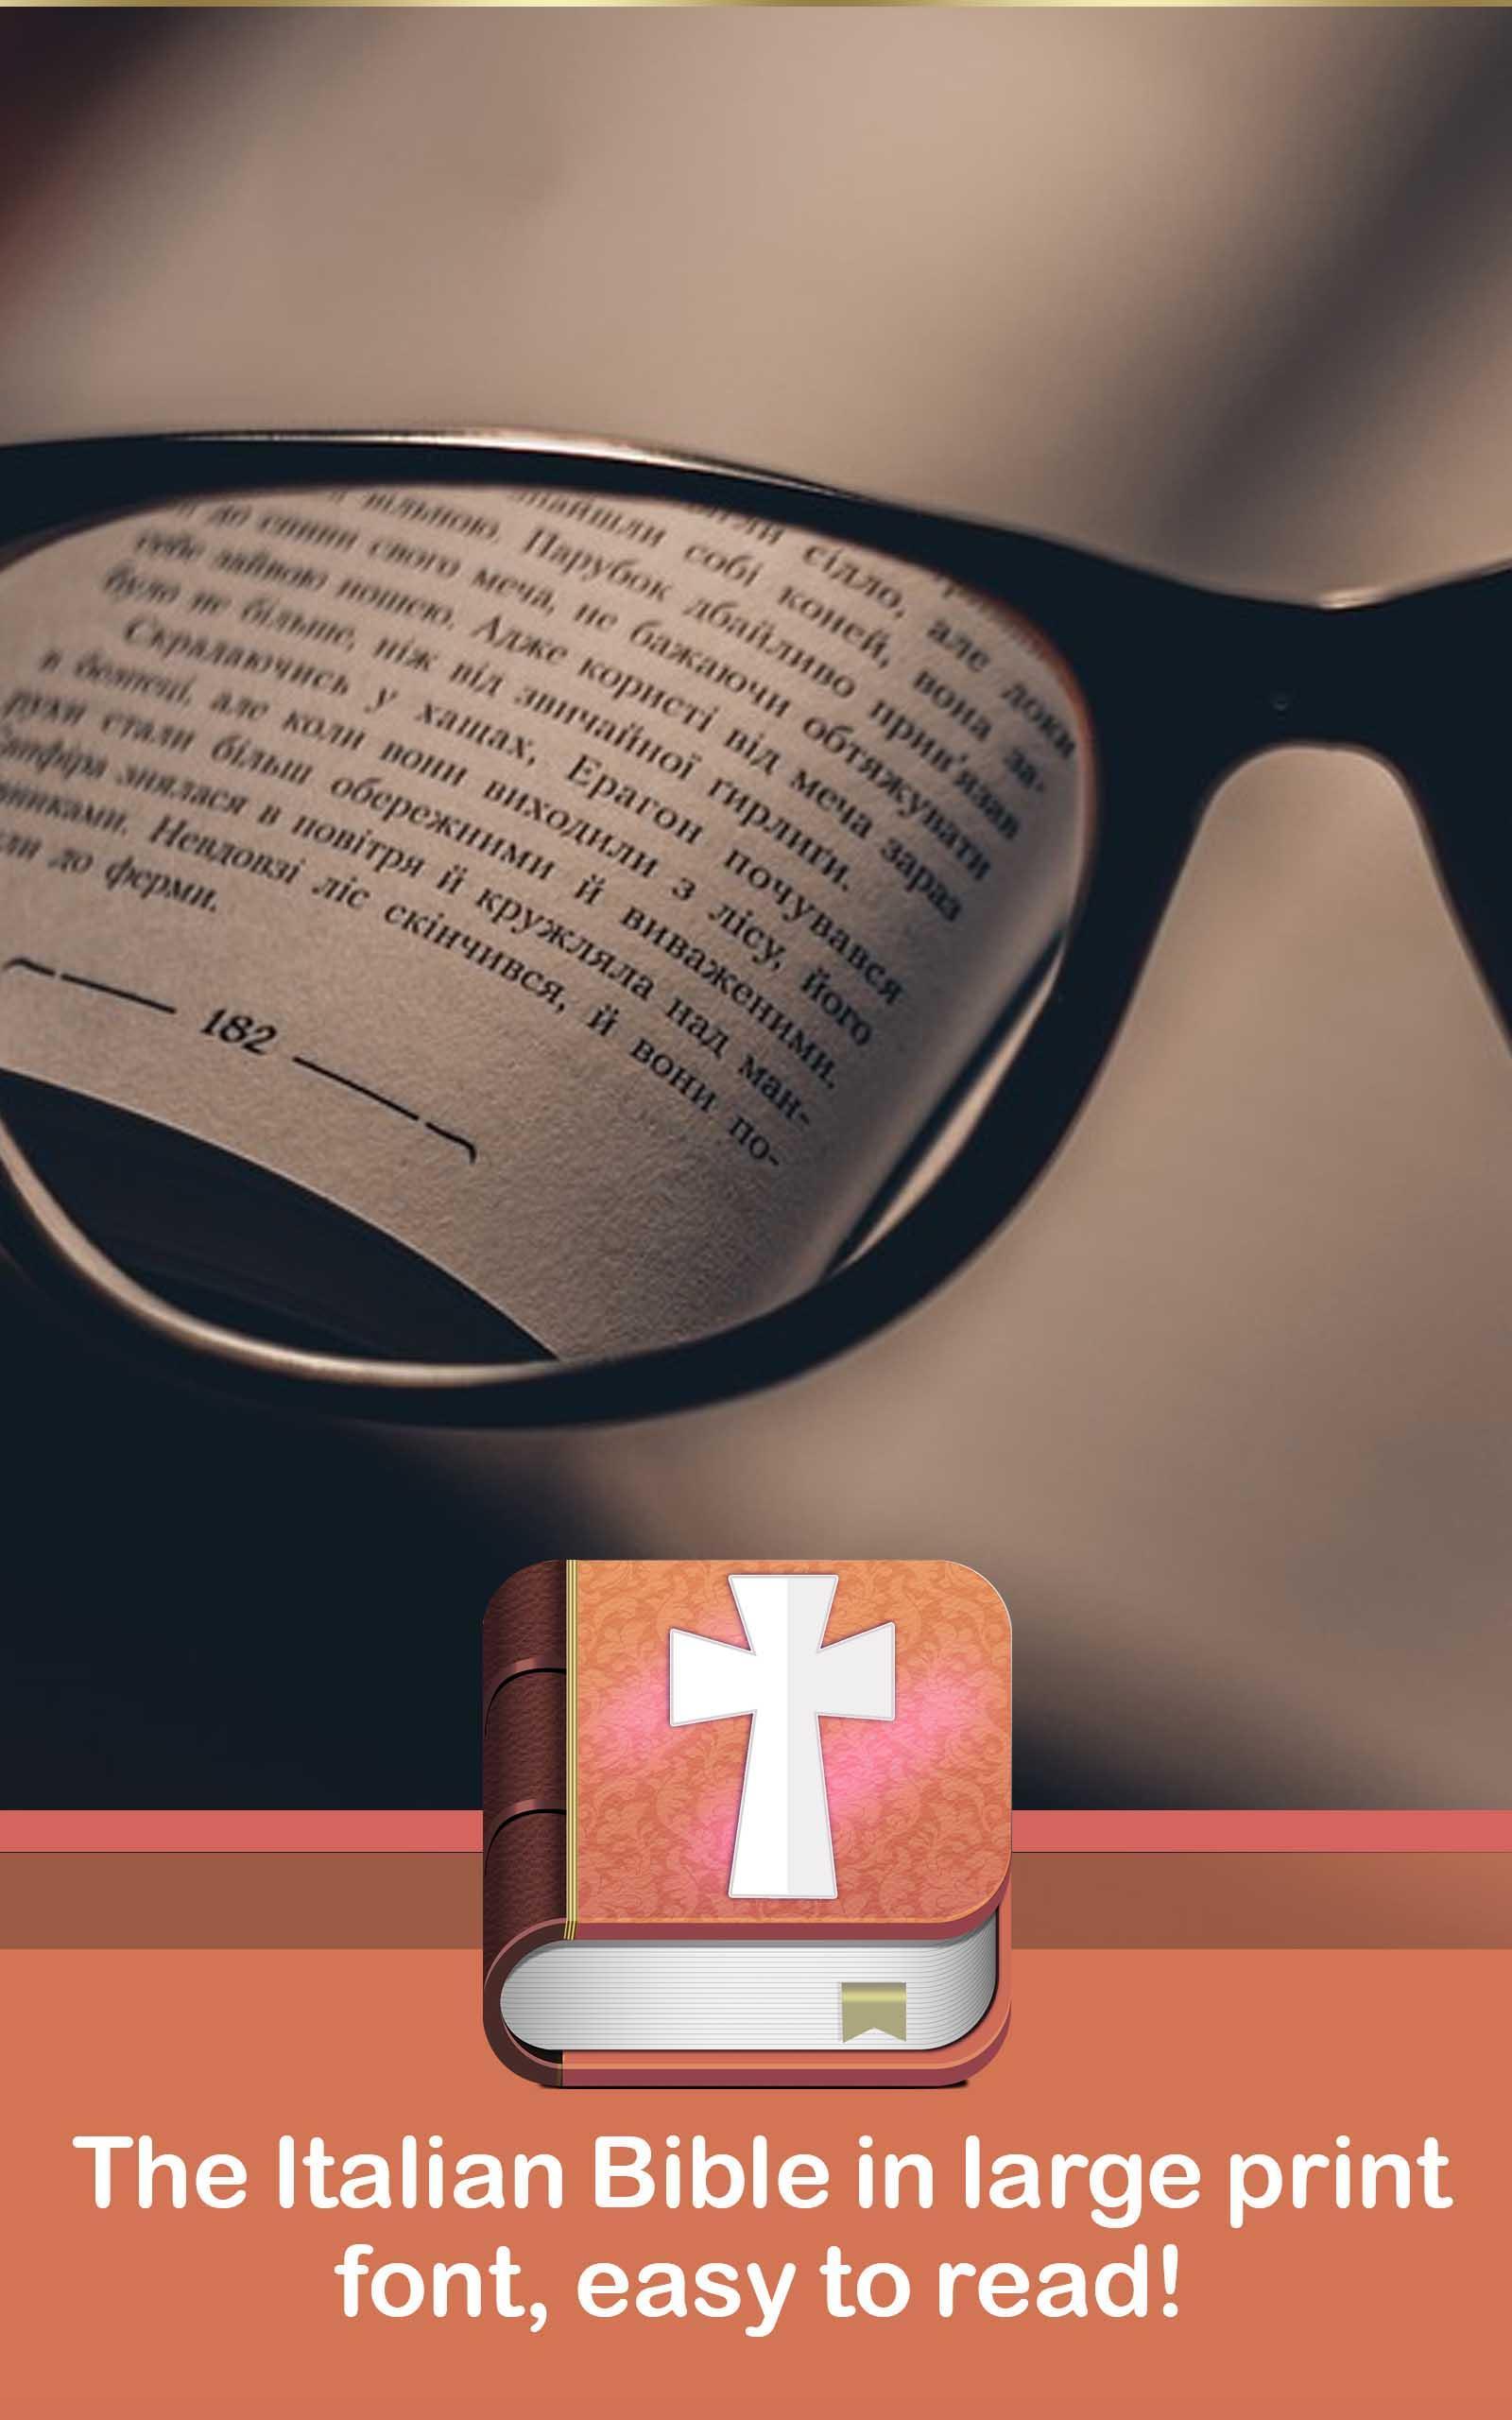 Large print Bible in Italian poster